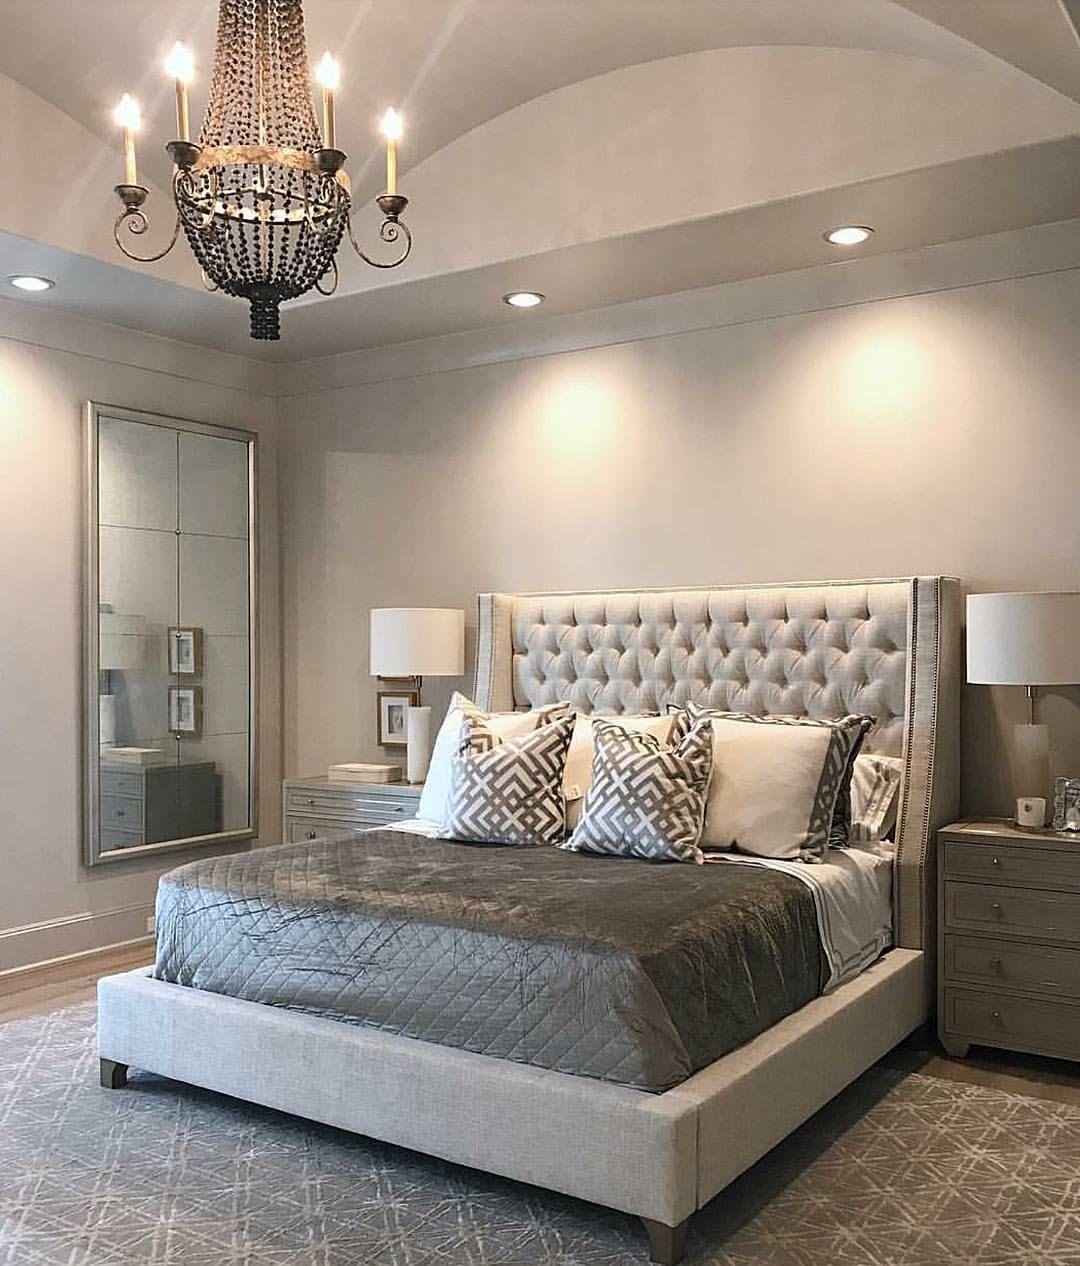 Dream Bedroom By Twothirtyfivedesigns Lovefordesigns